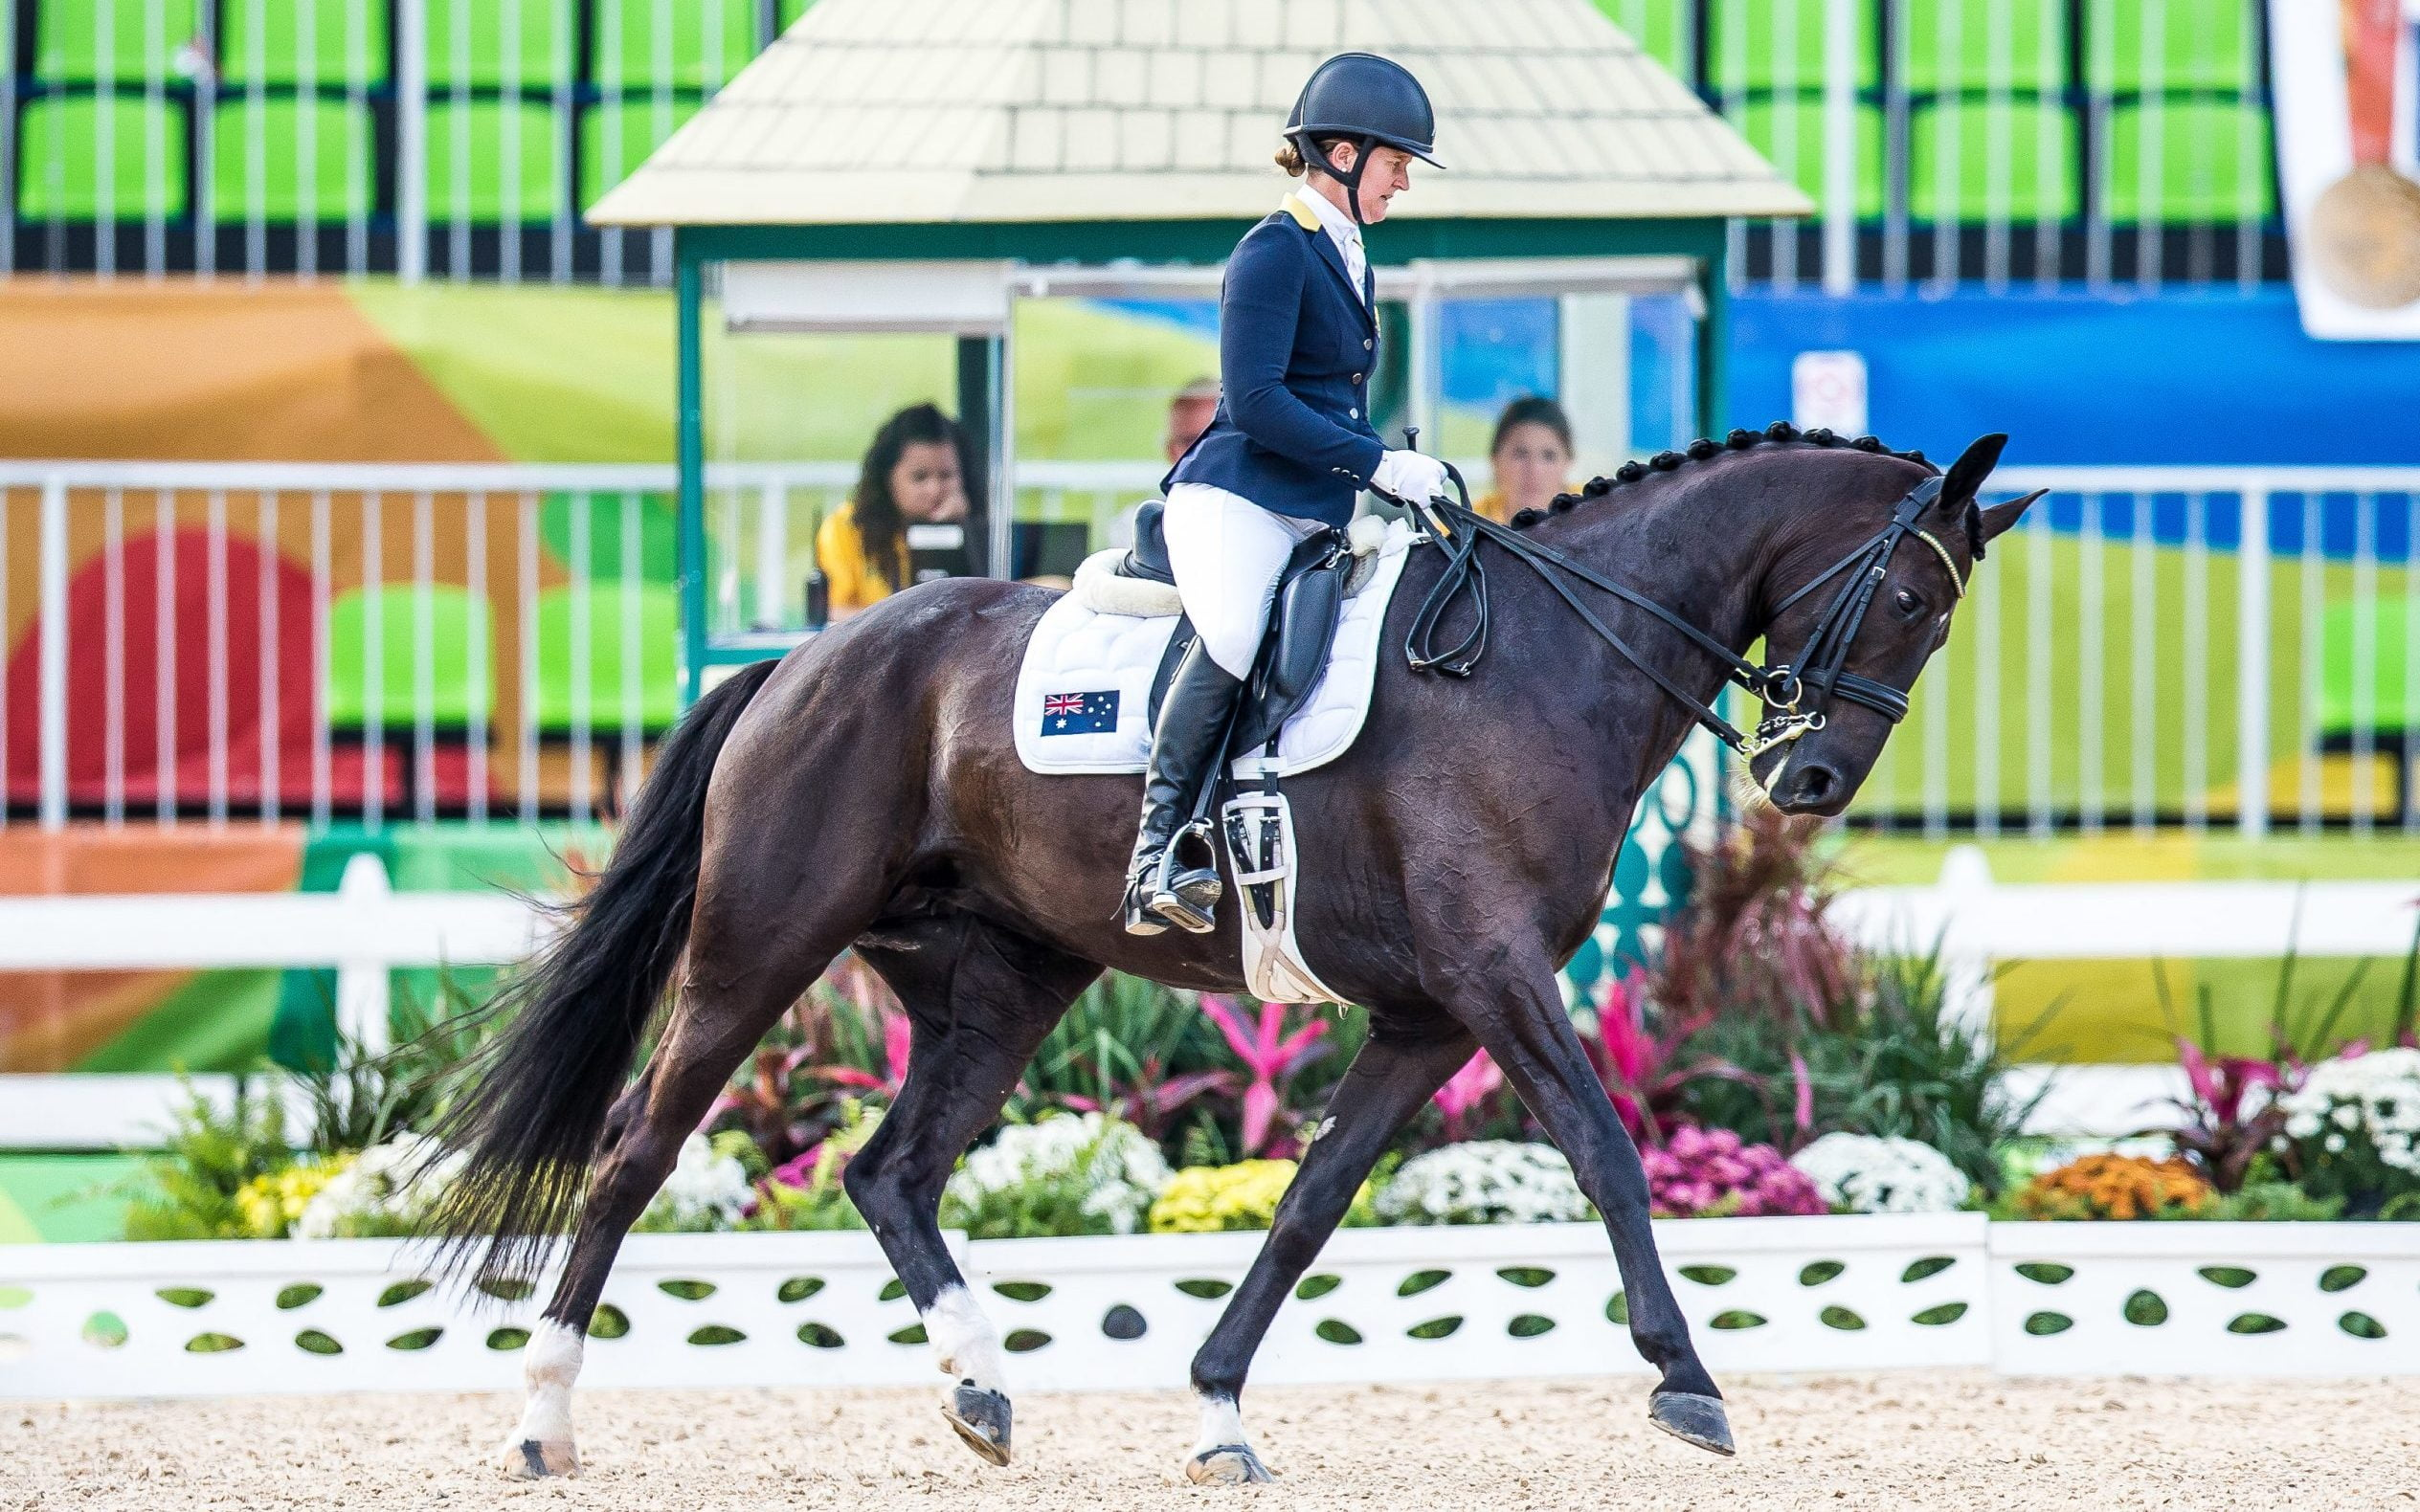 Fireworks spook Australian Paralympic equestrian team